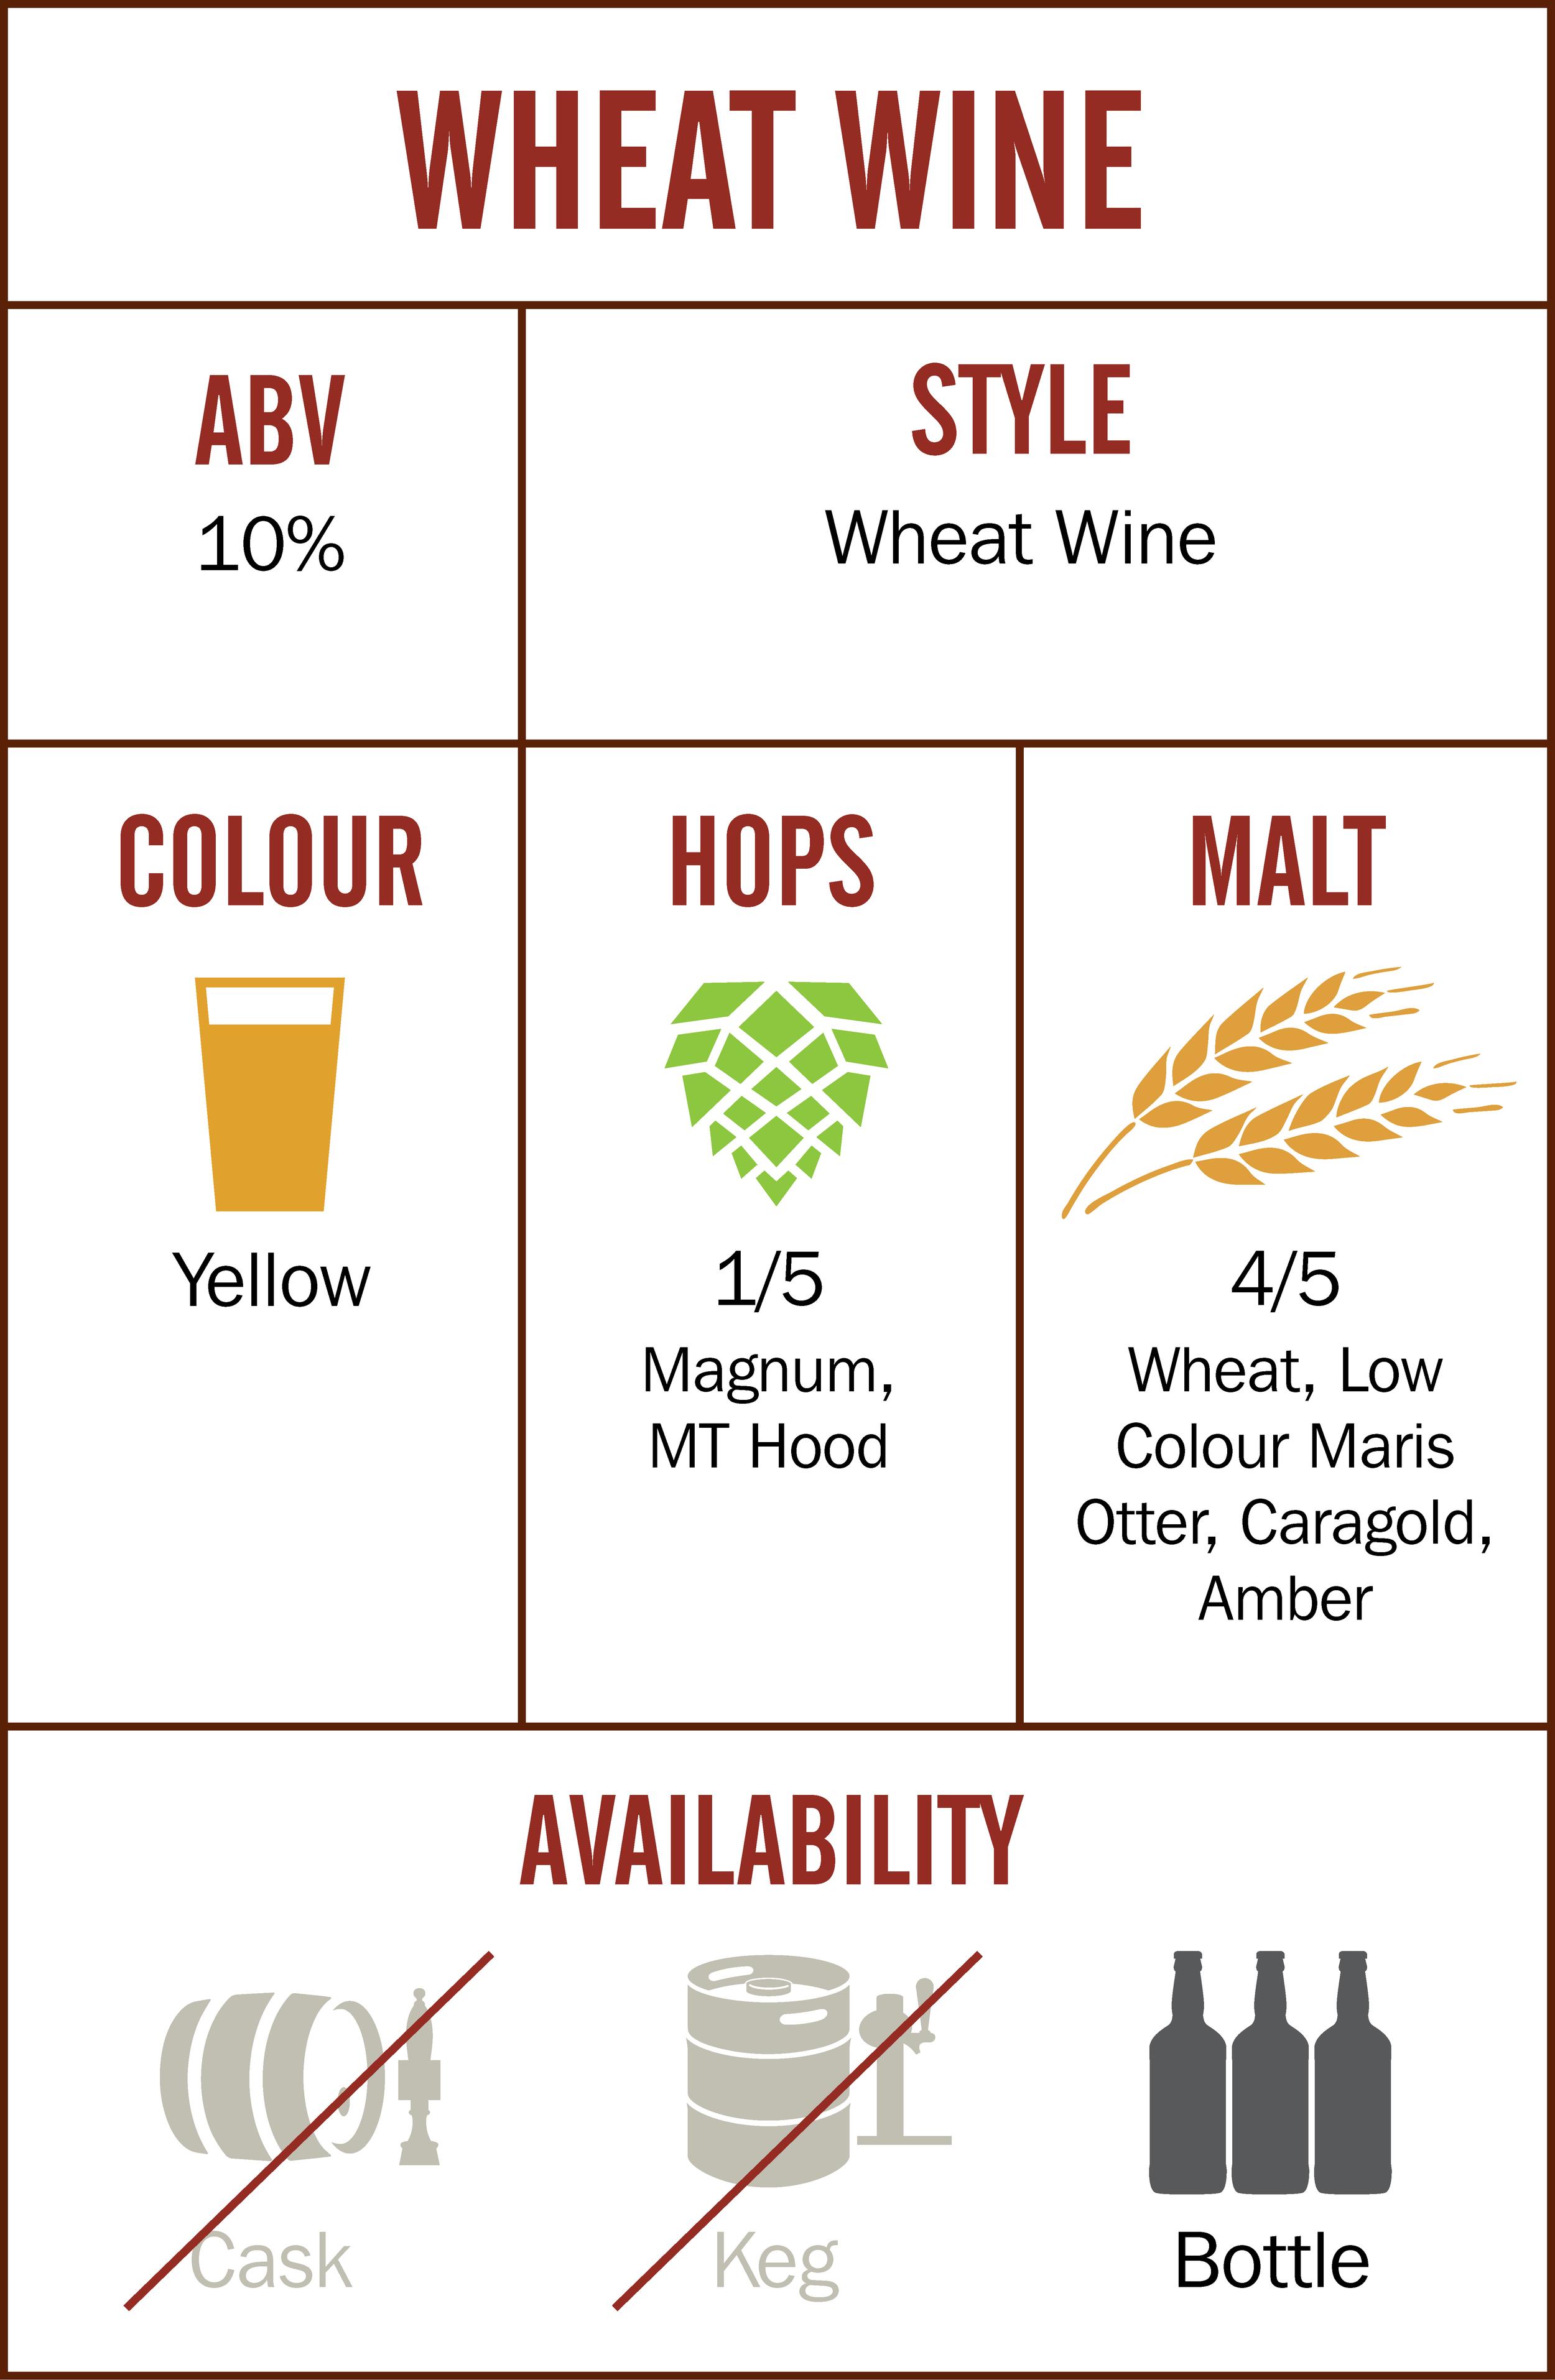 BBF Wheat Wine